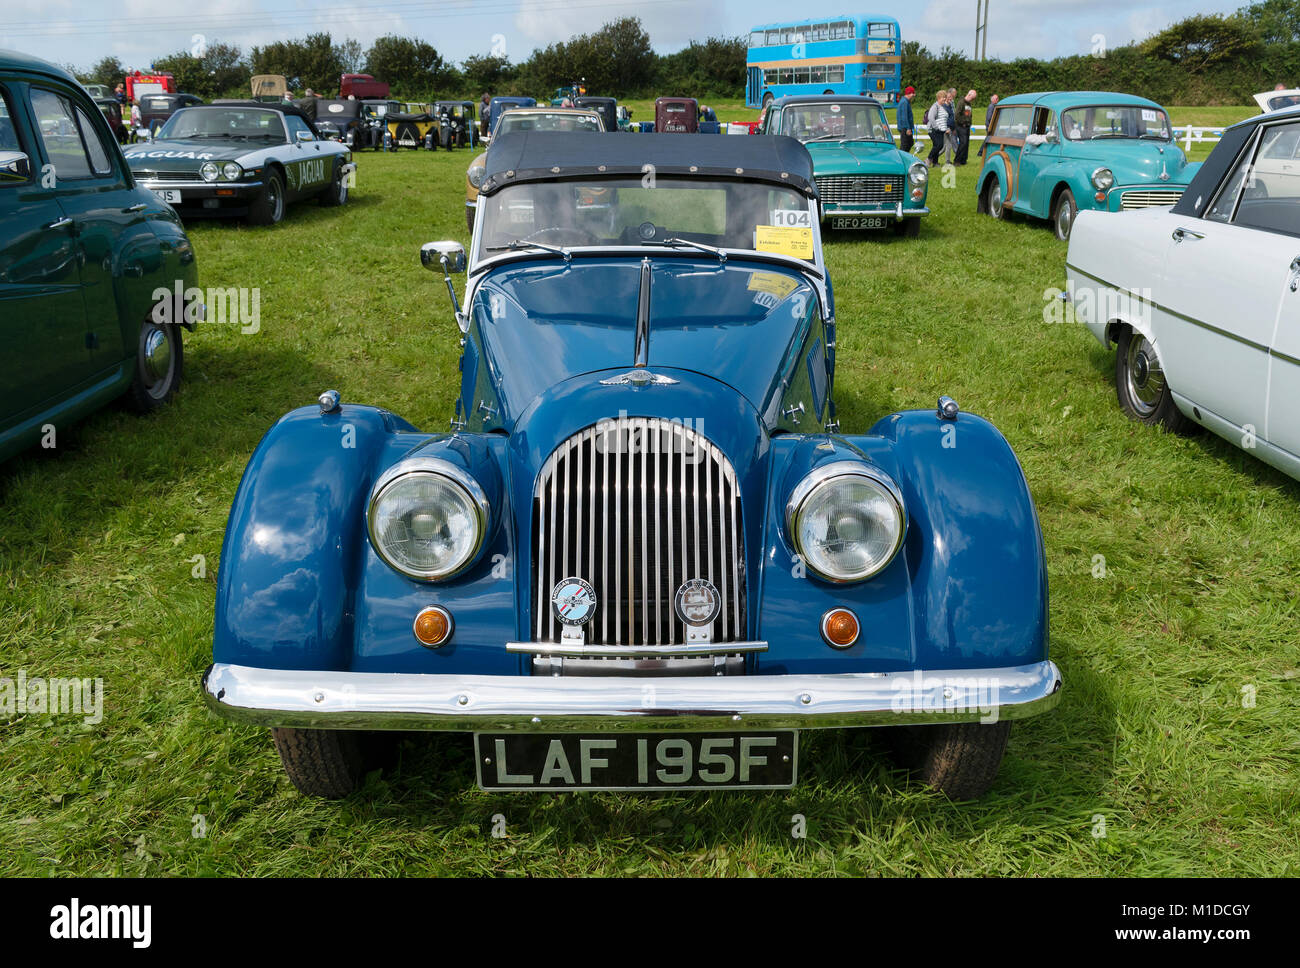 vintage morgan sports car, - Stock Image